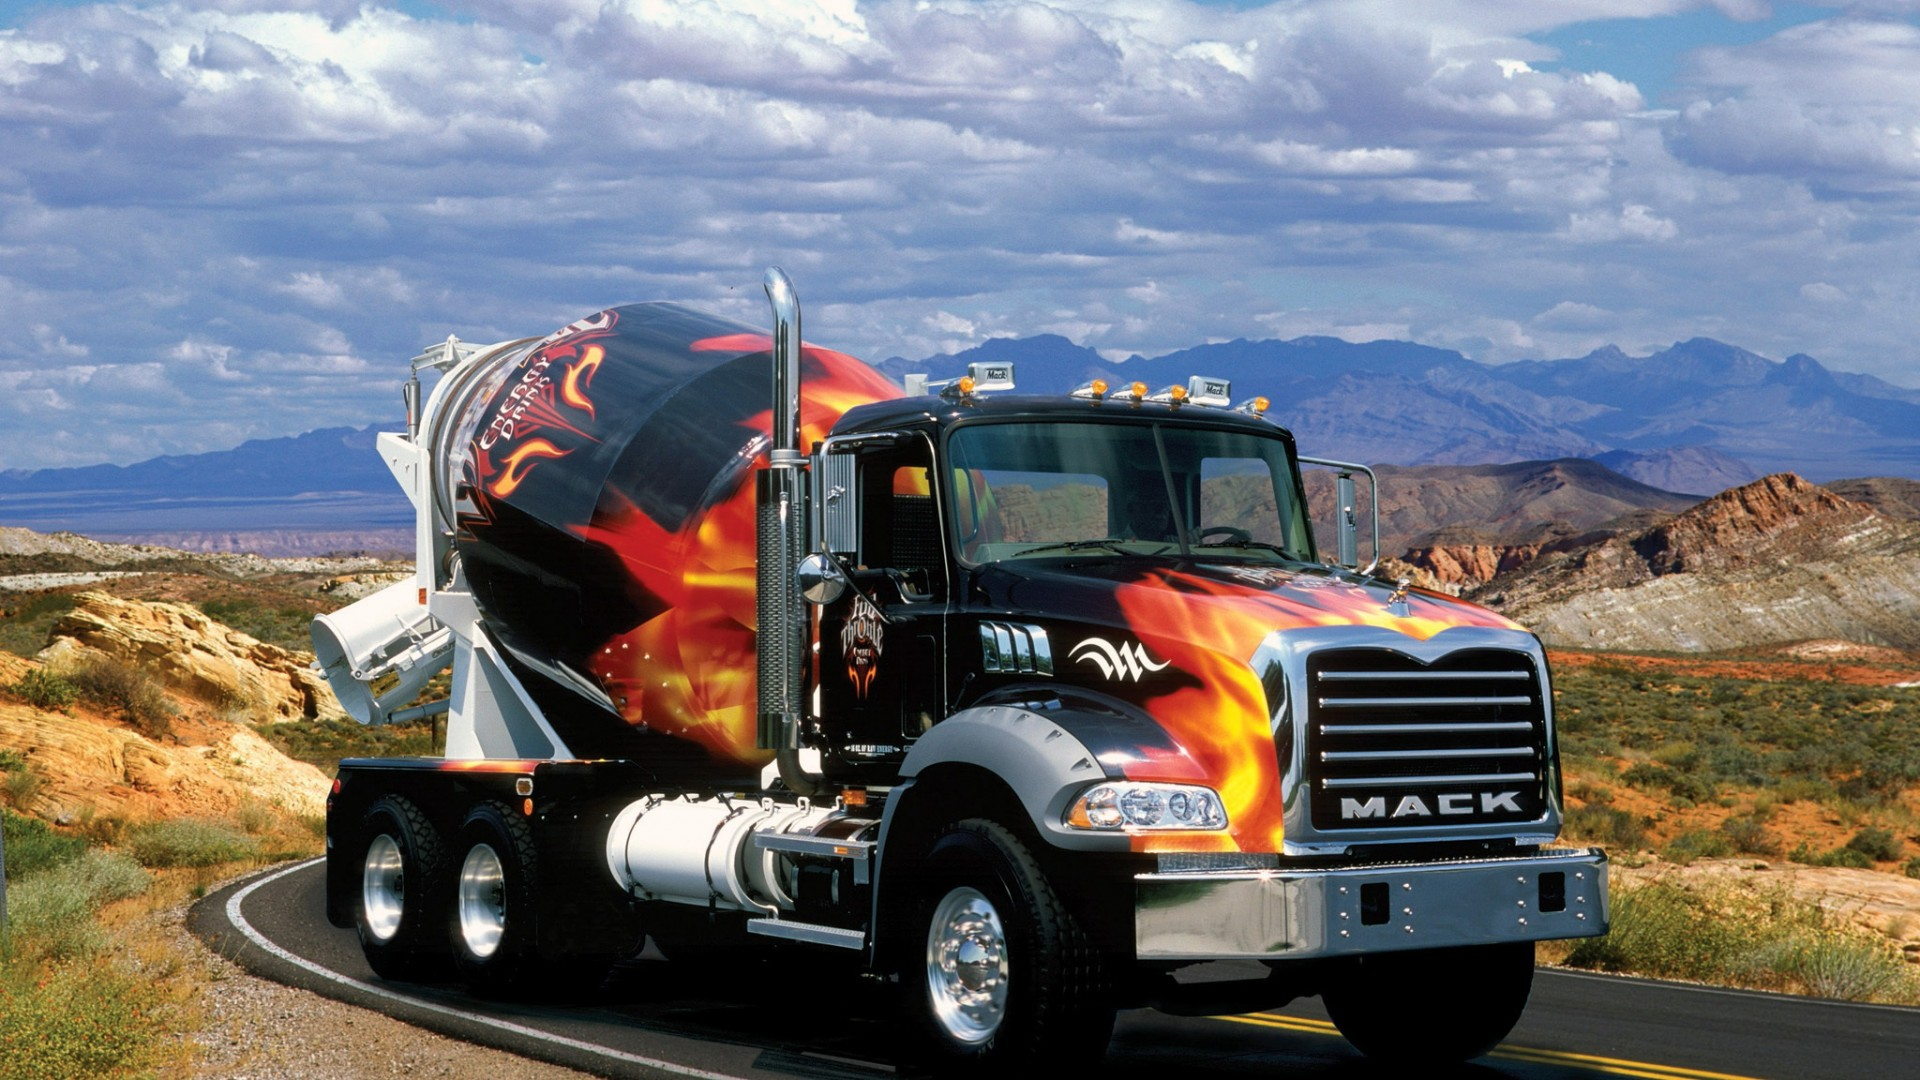 Mixer  mack  truck  clouds  cars   Free HD  HD Wallpaper